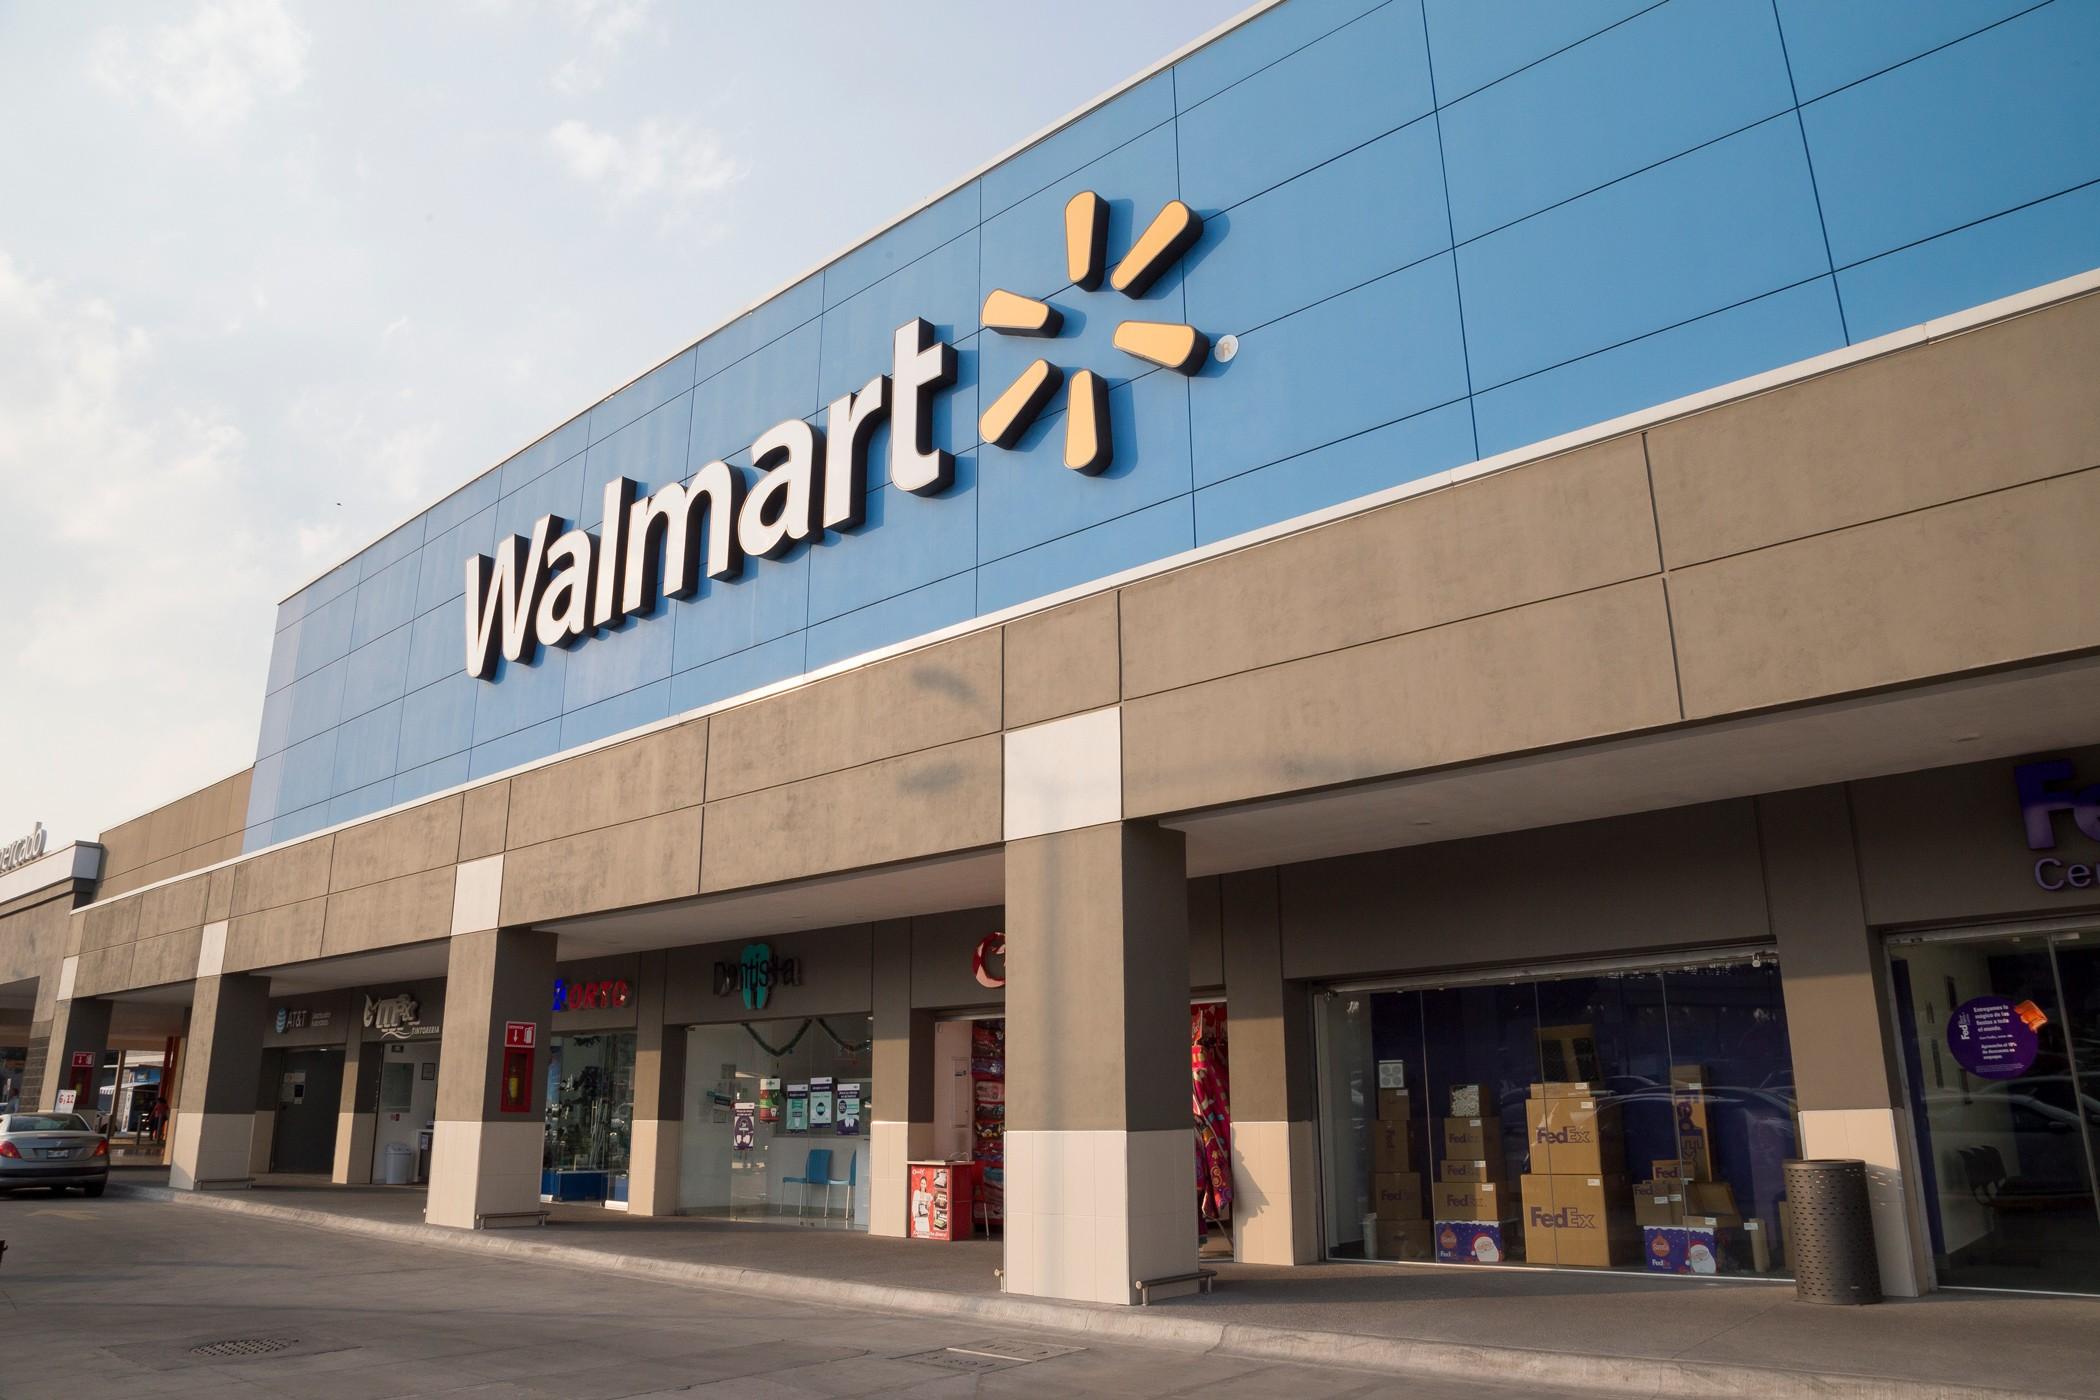 Walmart store exterior in Mexico